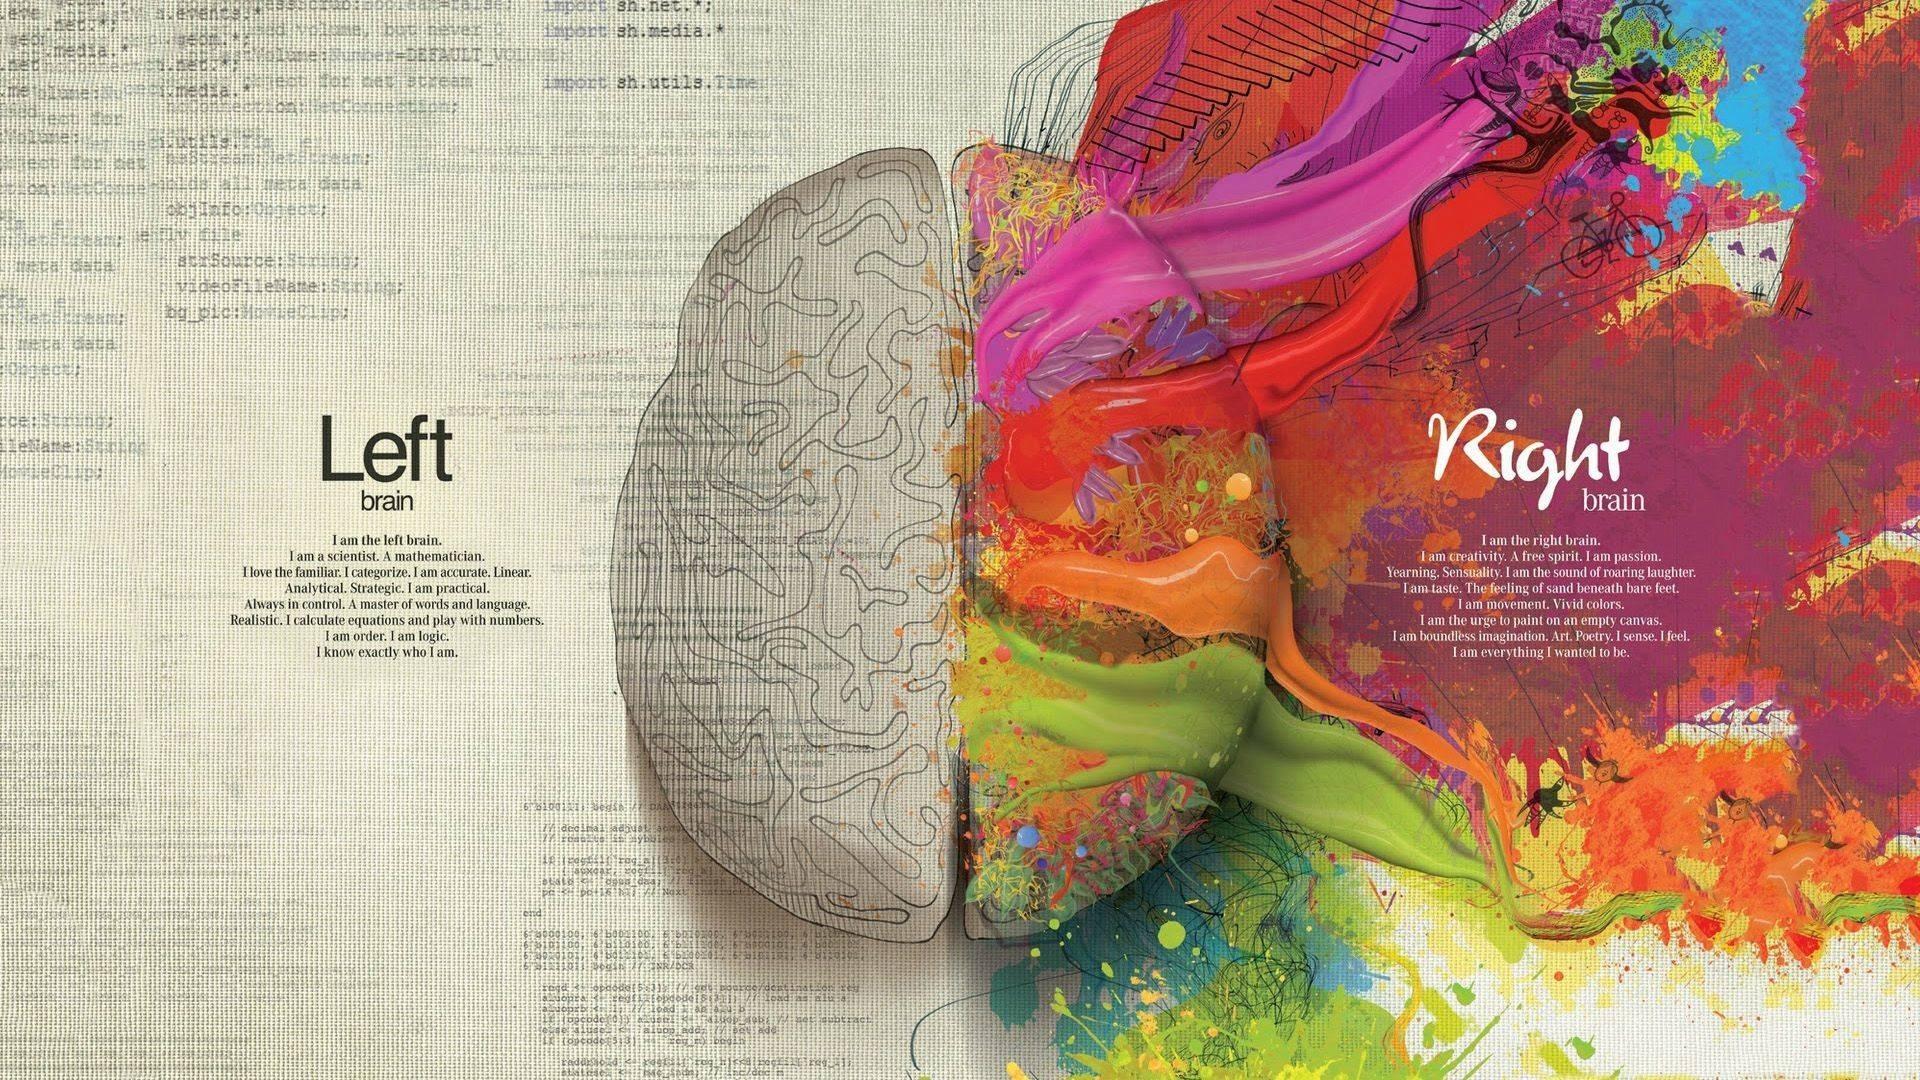 creative wallpaper ·① download free hd wallpapers for desktop